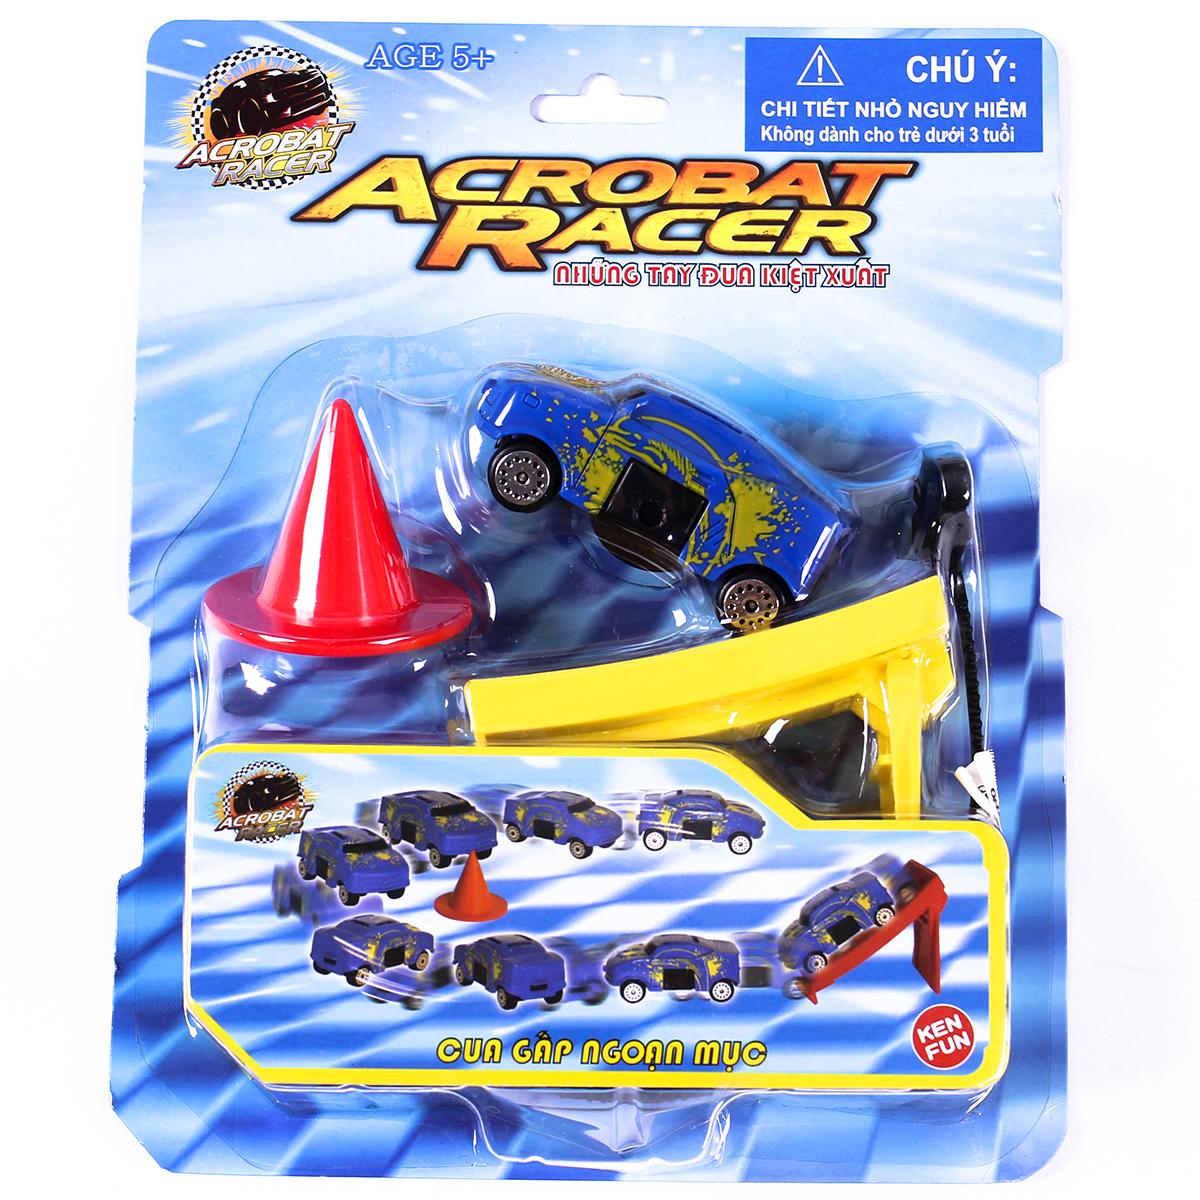 Xe do choi Acrobat Racer - Cua gap ngoan muc